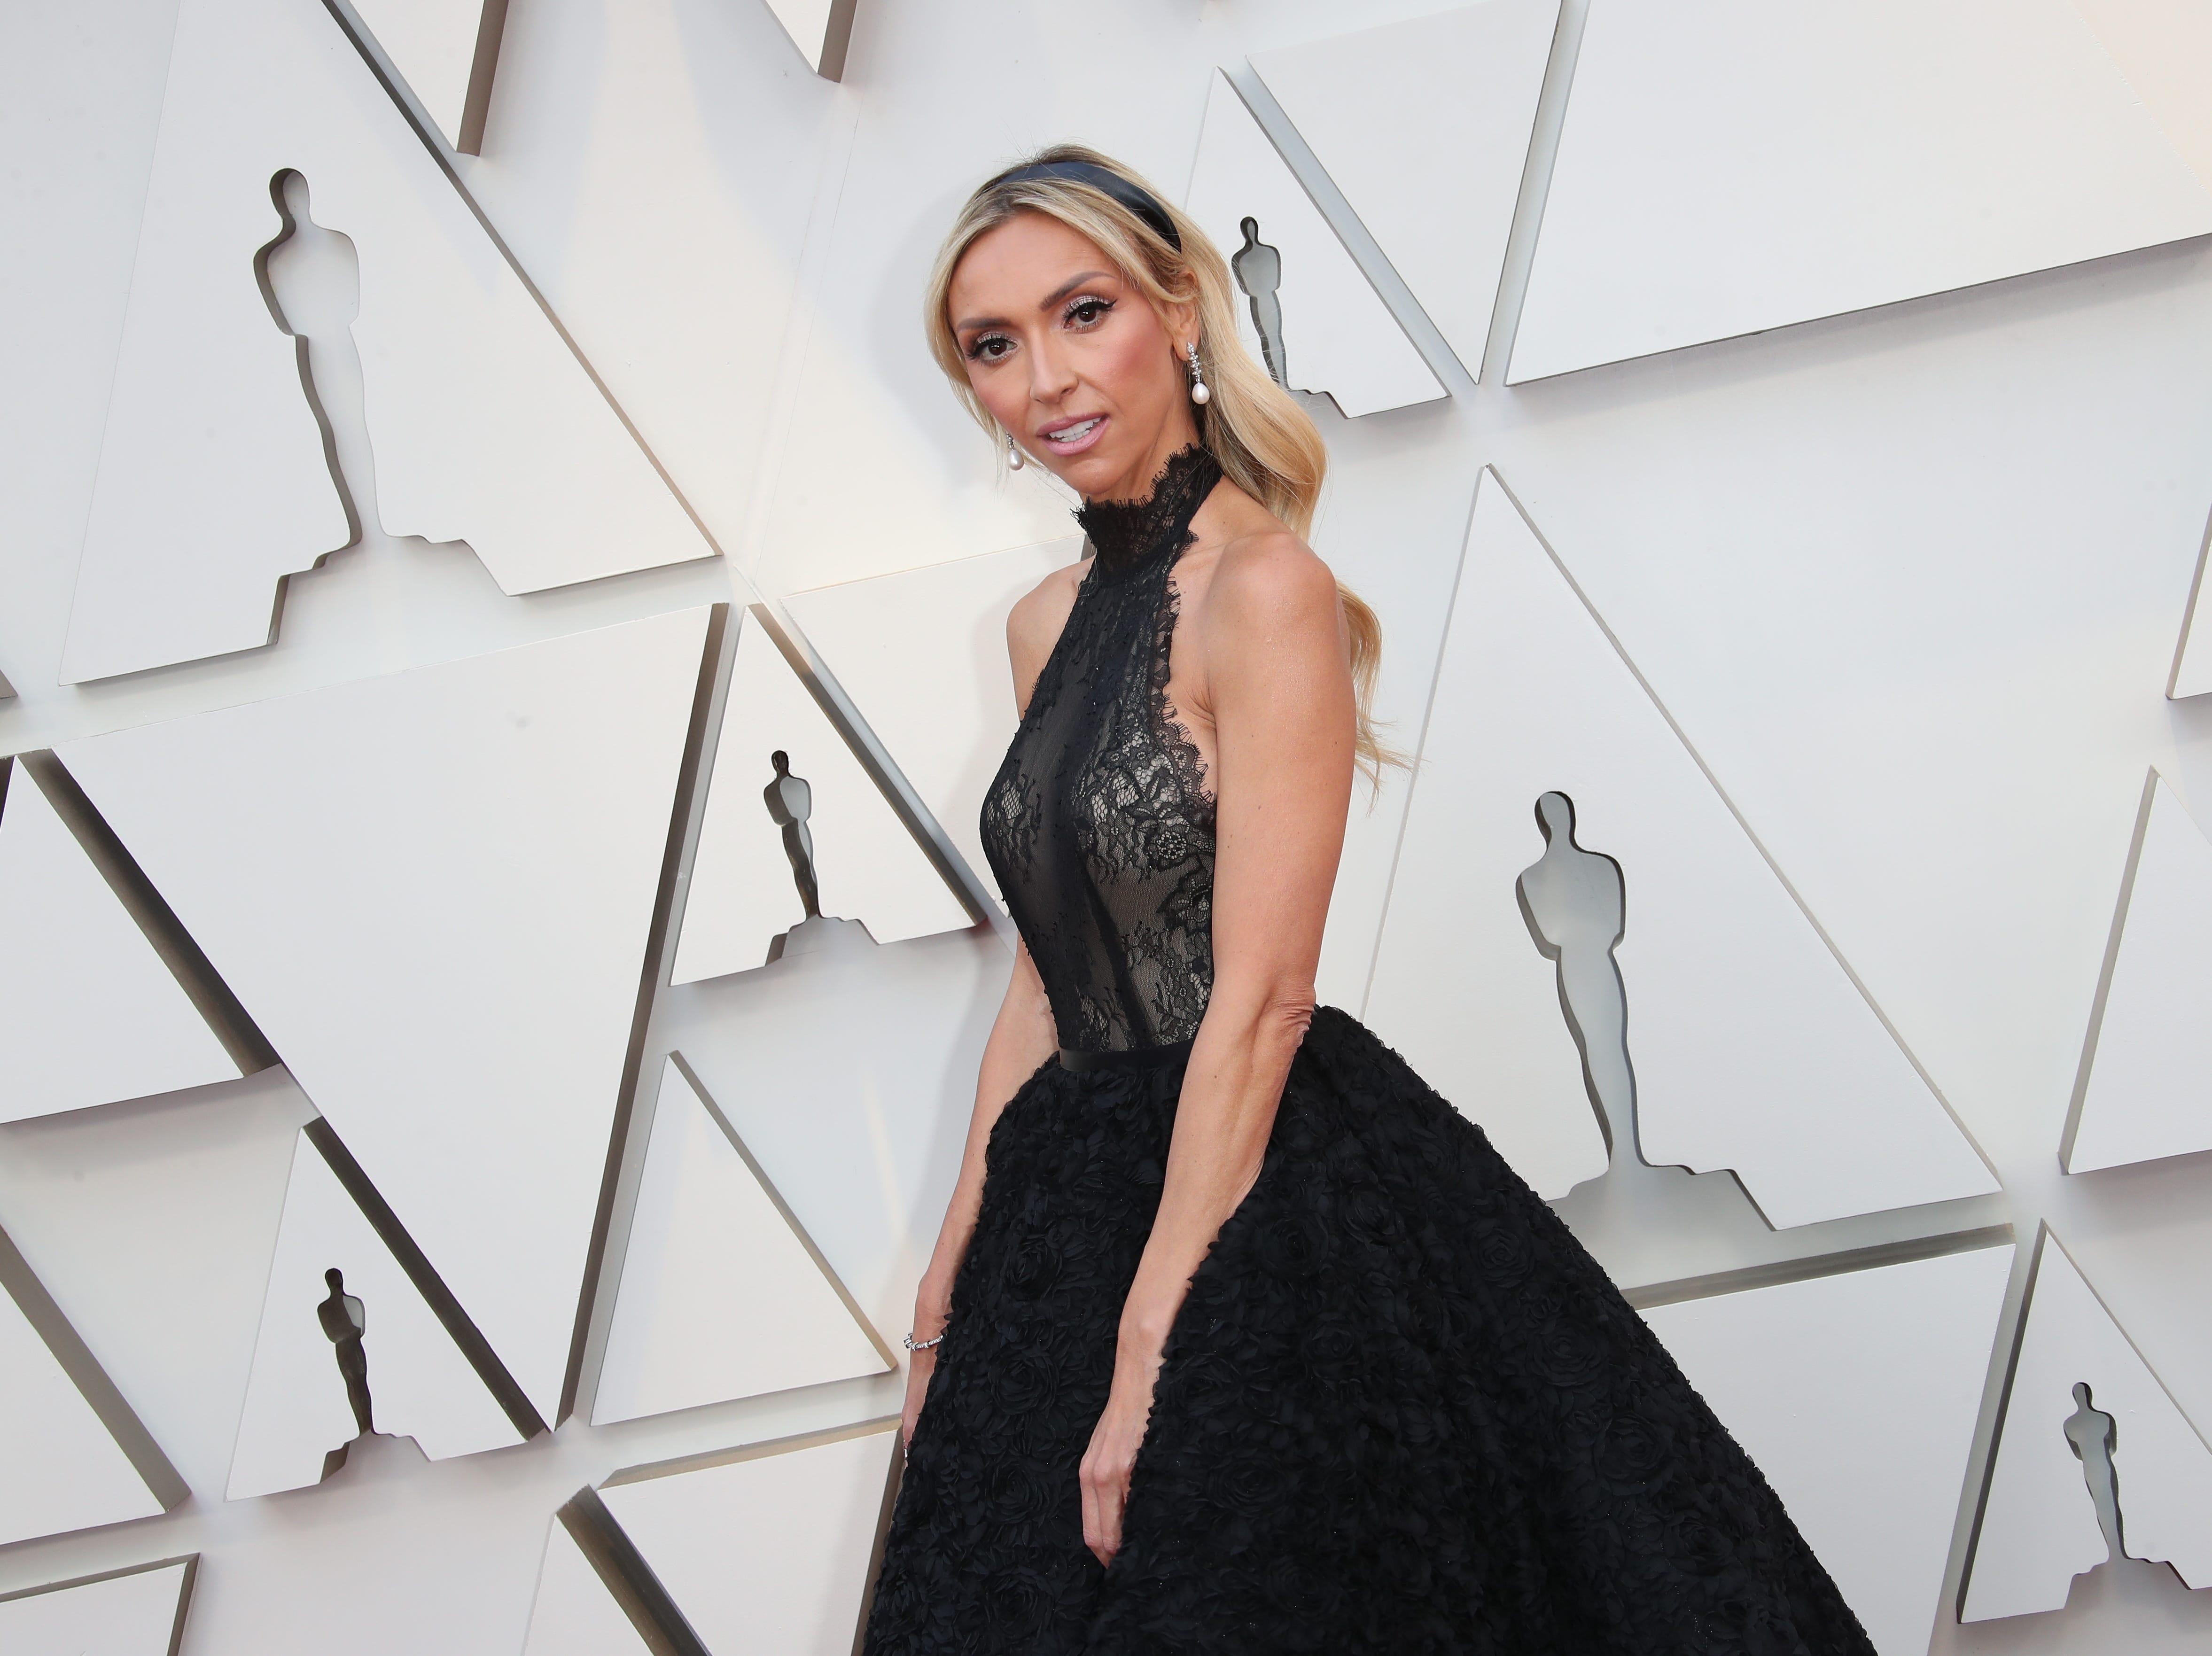 February 24, 2019; Los Angeles, CA, USA; Giuliana Rancic arrives at the 91st Academy Awards at the Dolby Theatre. Mandatory Credit: Dan MacMedan-USA TODAY NETWORK (Via OlyDrop)